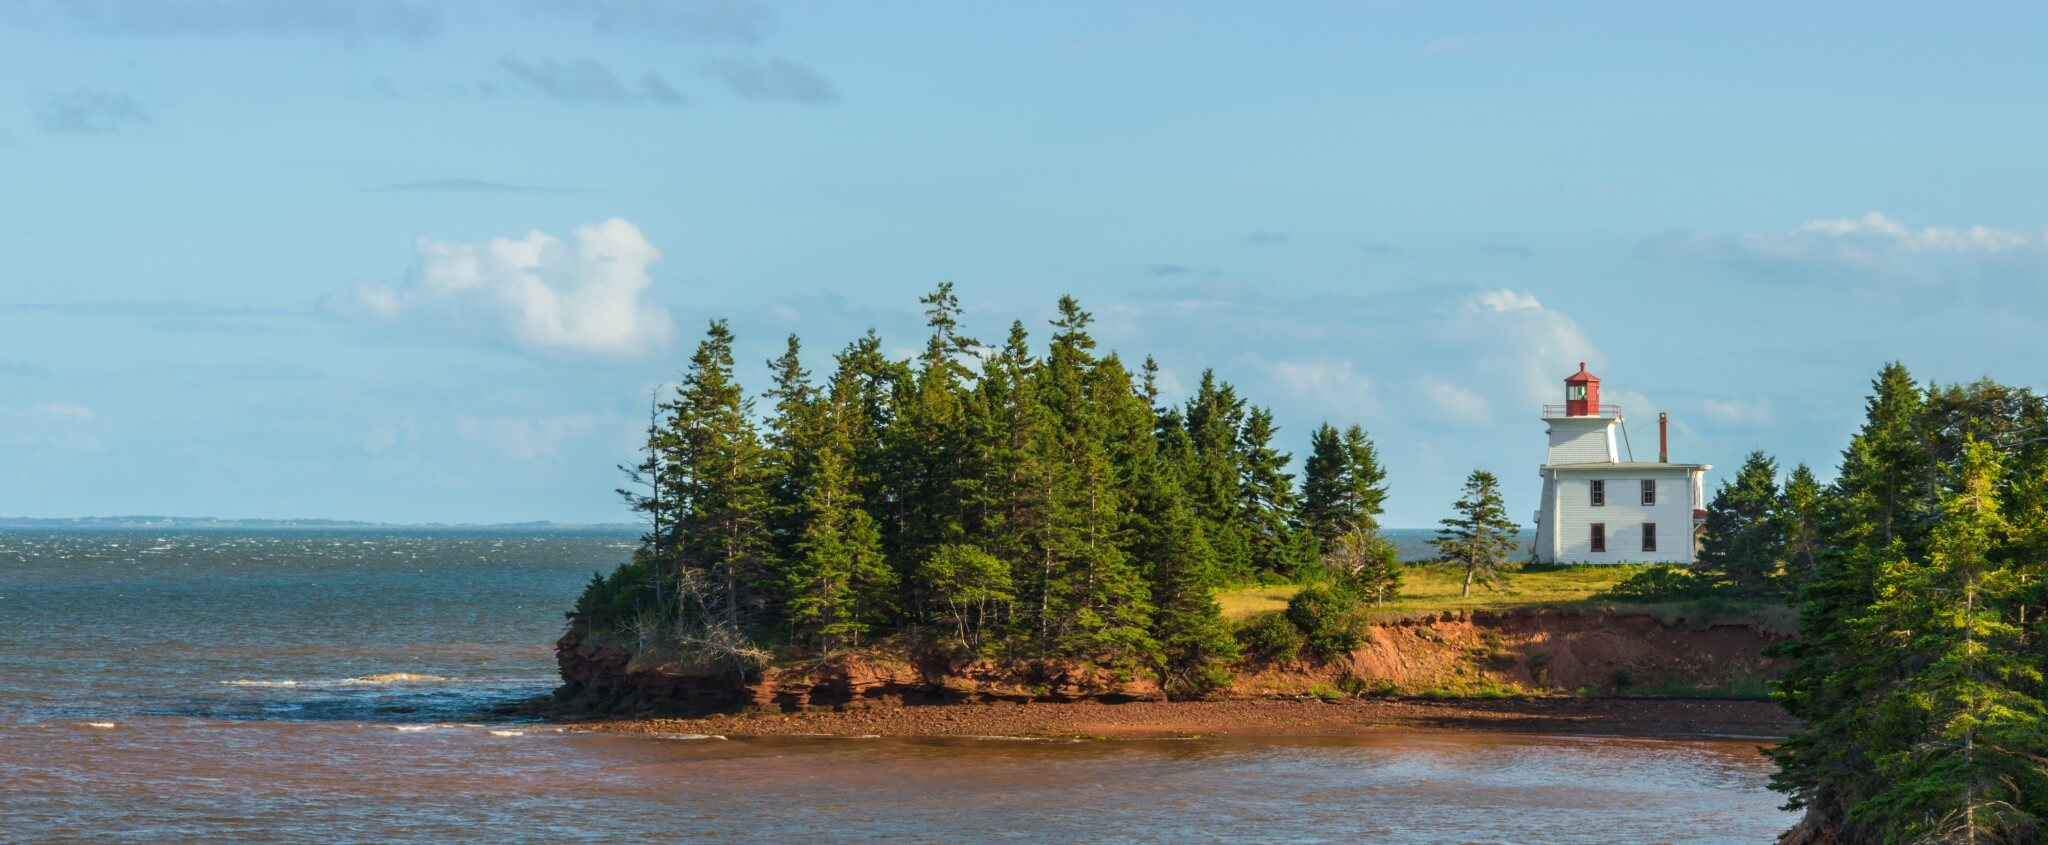 Best Time To Go To Prince Edward Island